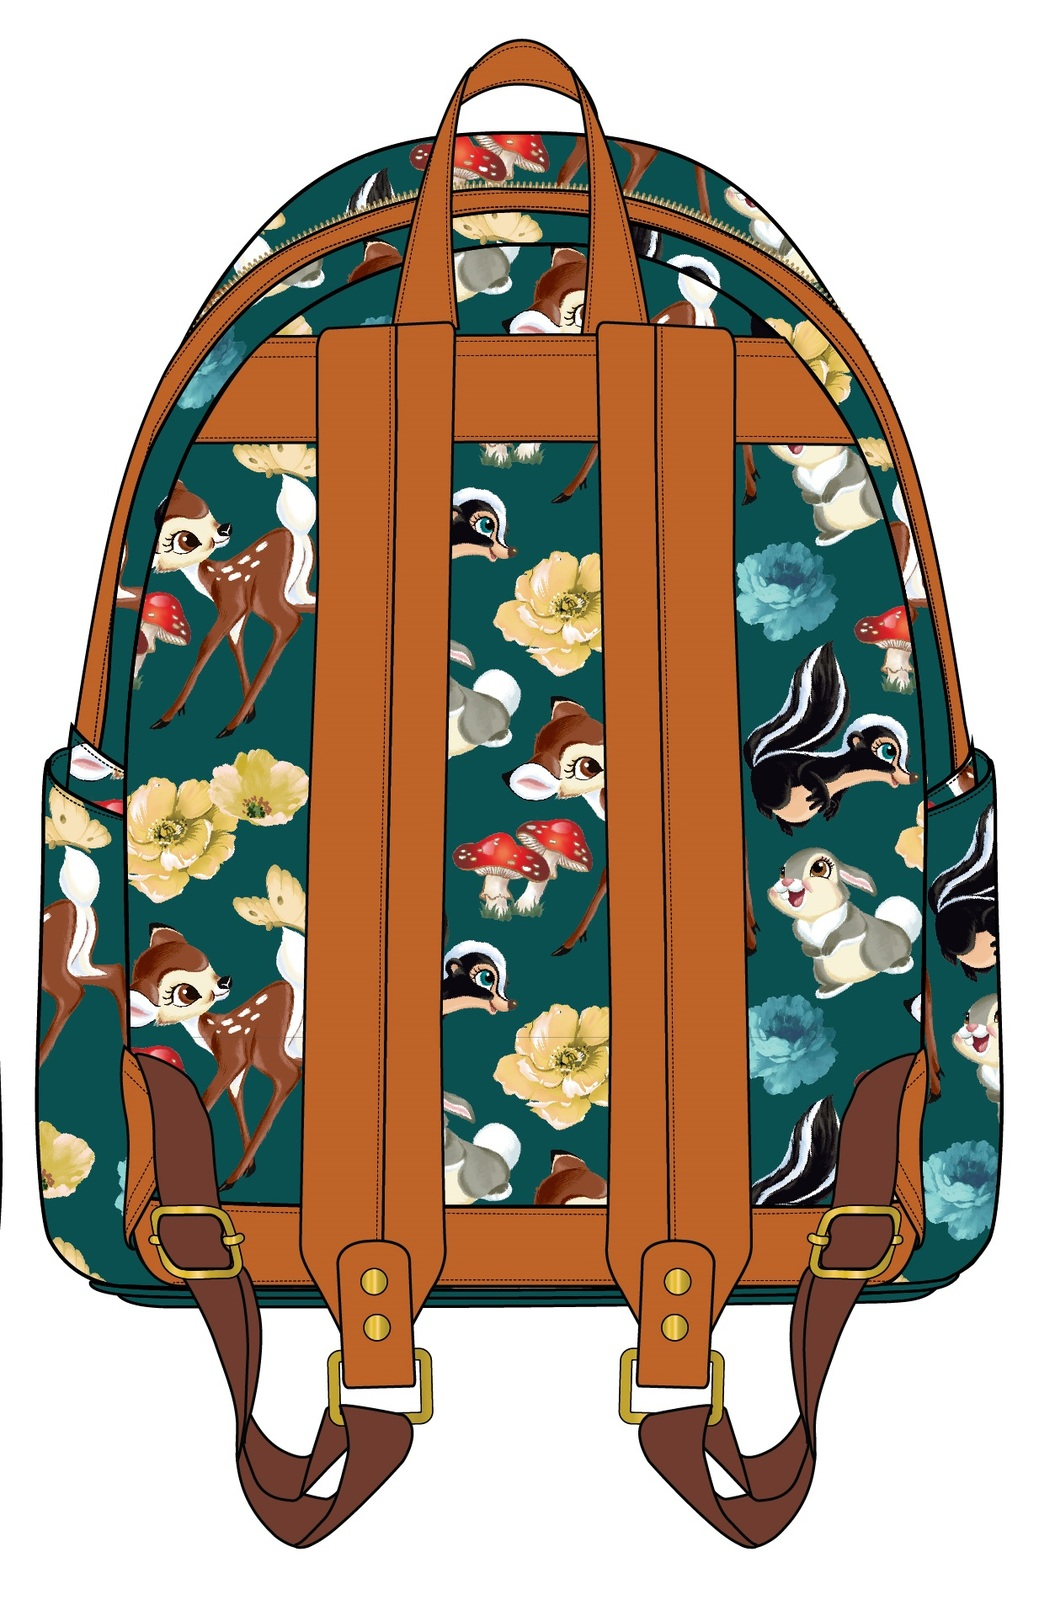 43daef80774 ... Loungefly  Disney Bambi   Friends - Mini Backpack image ...